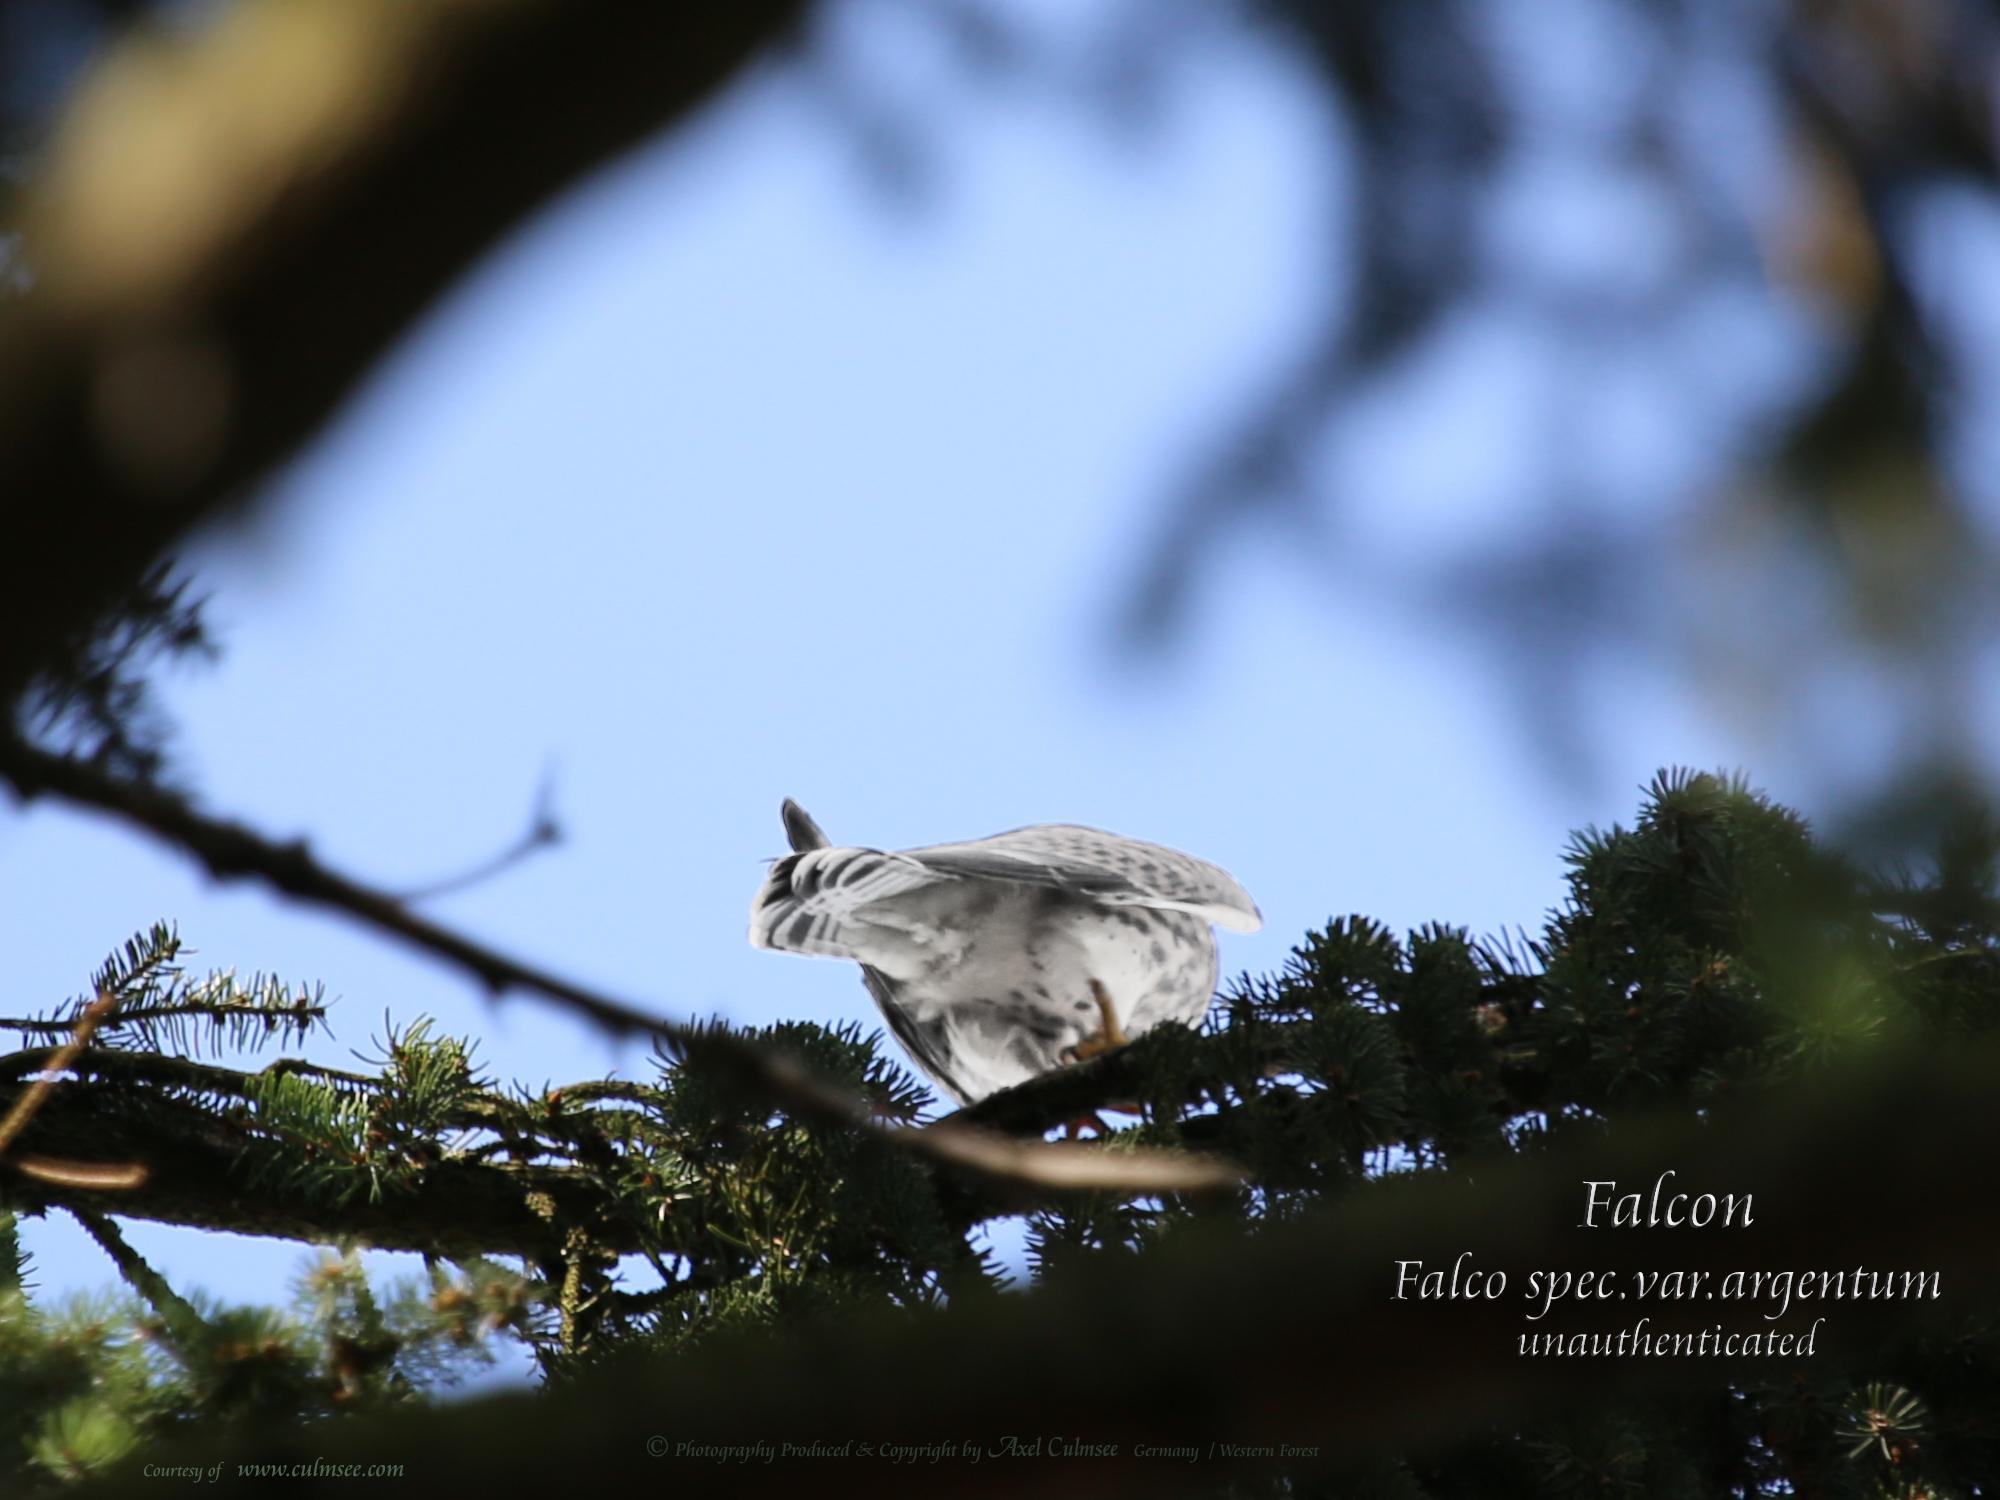 Falcon spec.var. argentum - unconfirmed